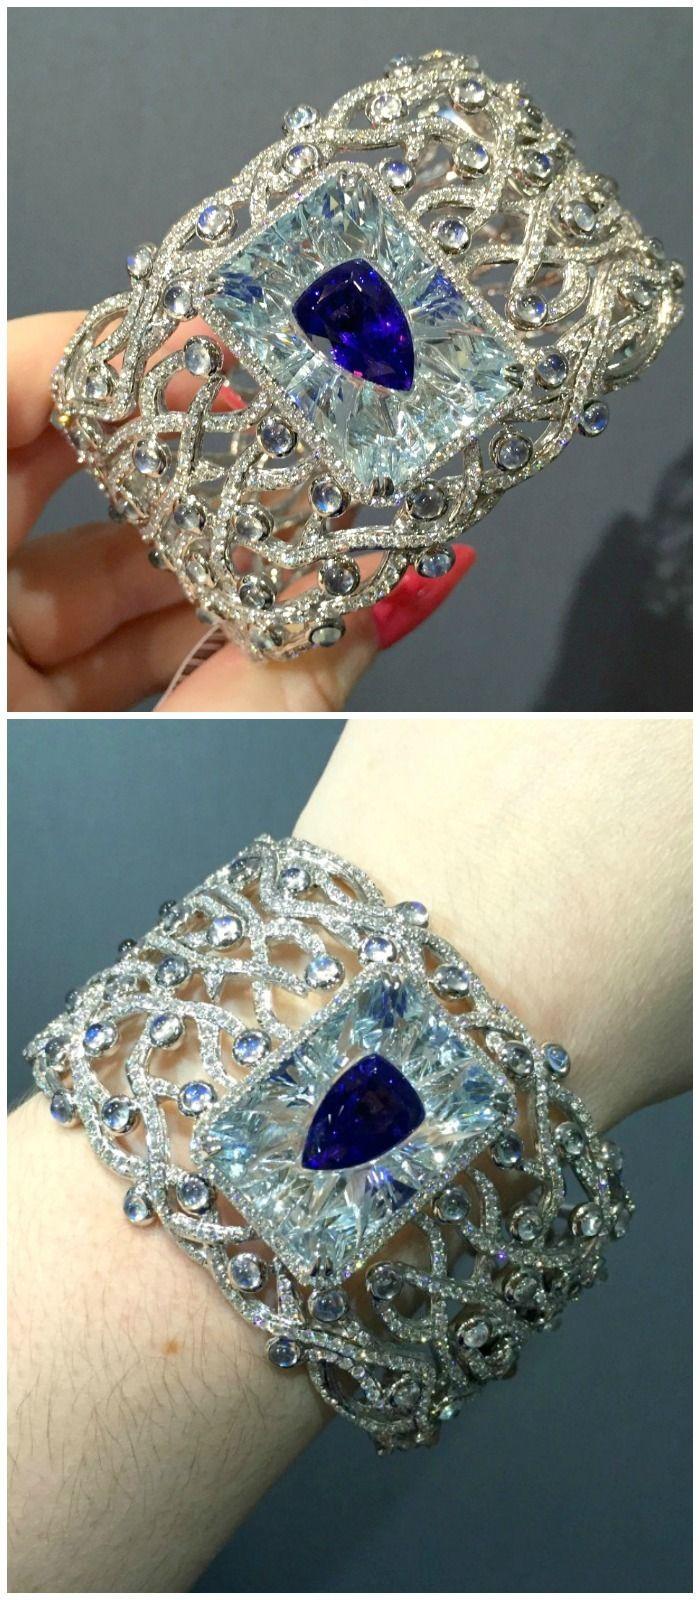 Yael Designs Tanzanite, Aquamarine, Moonstone, and Diamond Bangle